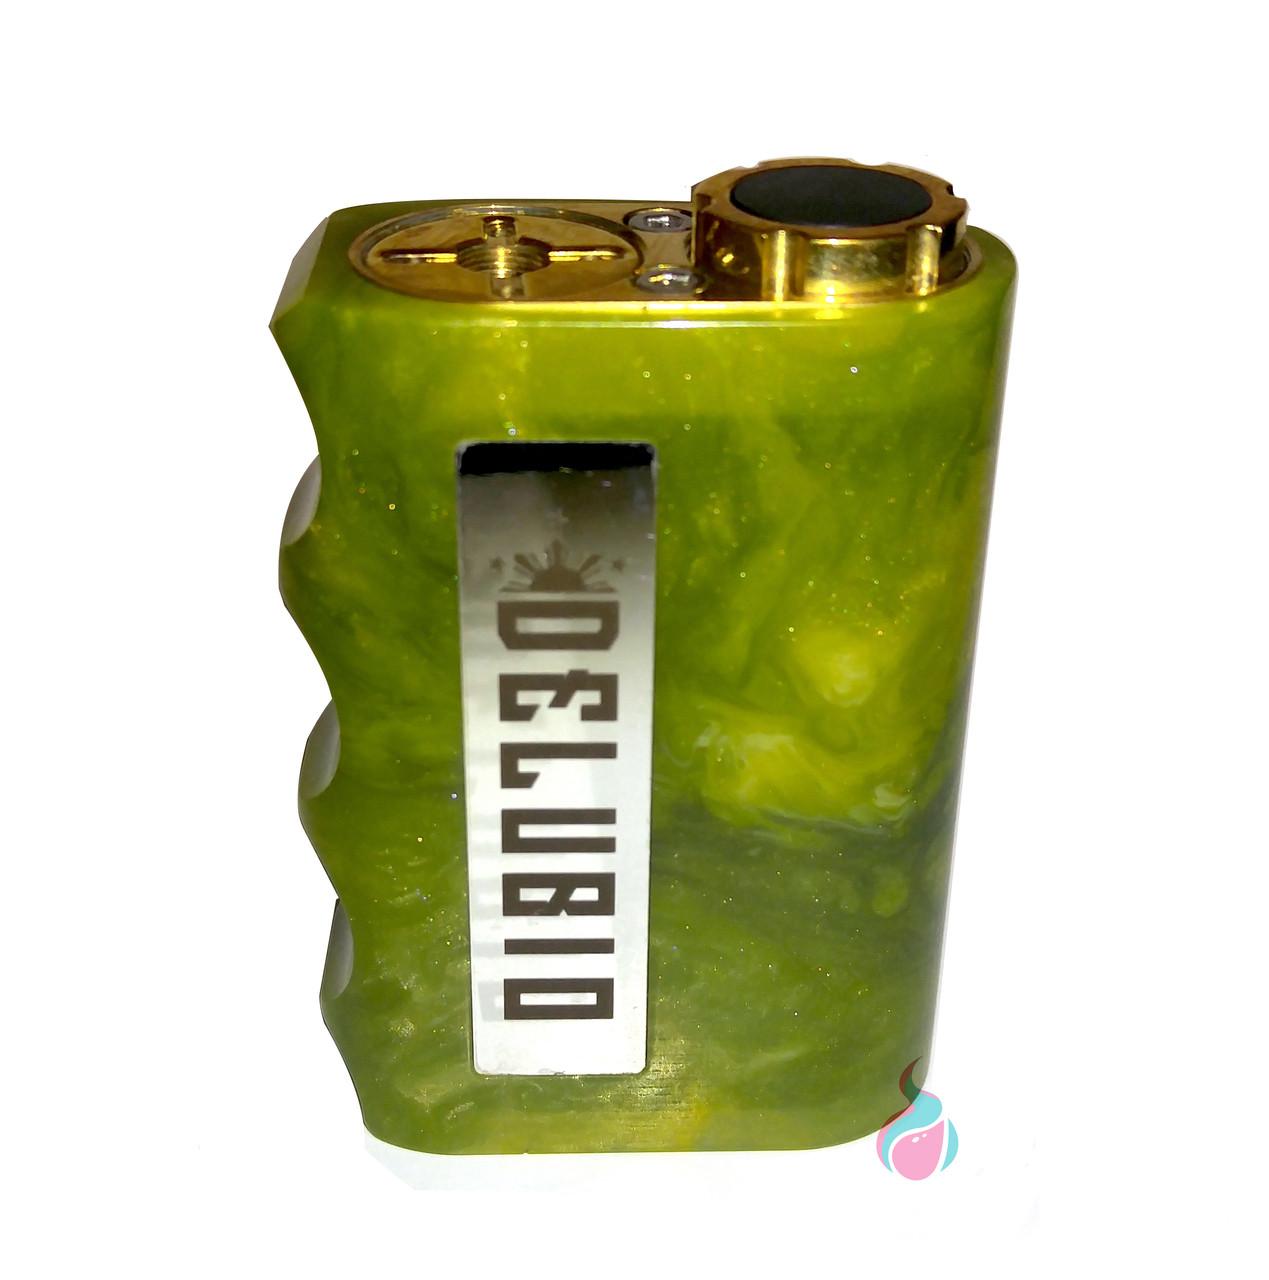 Delubio Series Box Mod By Silver Wolf Customs - Ultra Vapor Bar